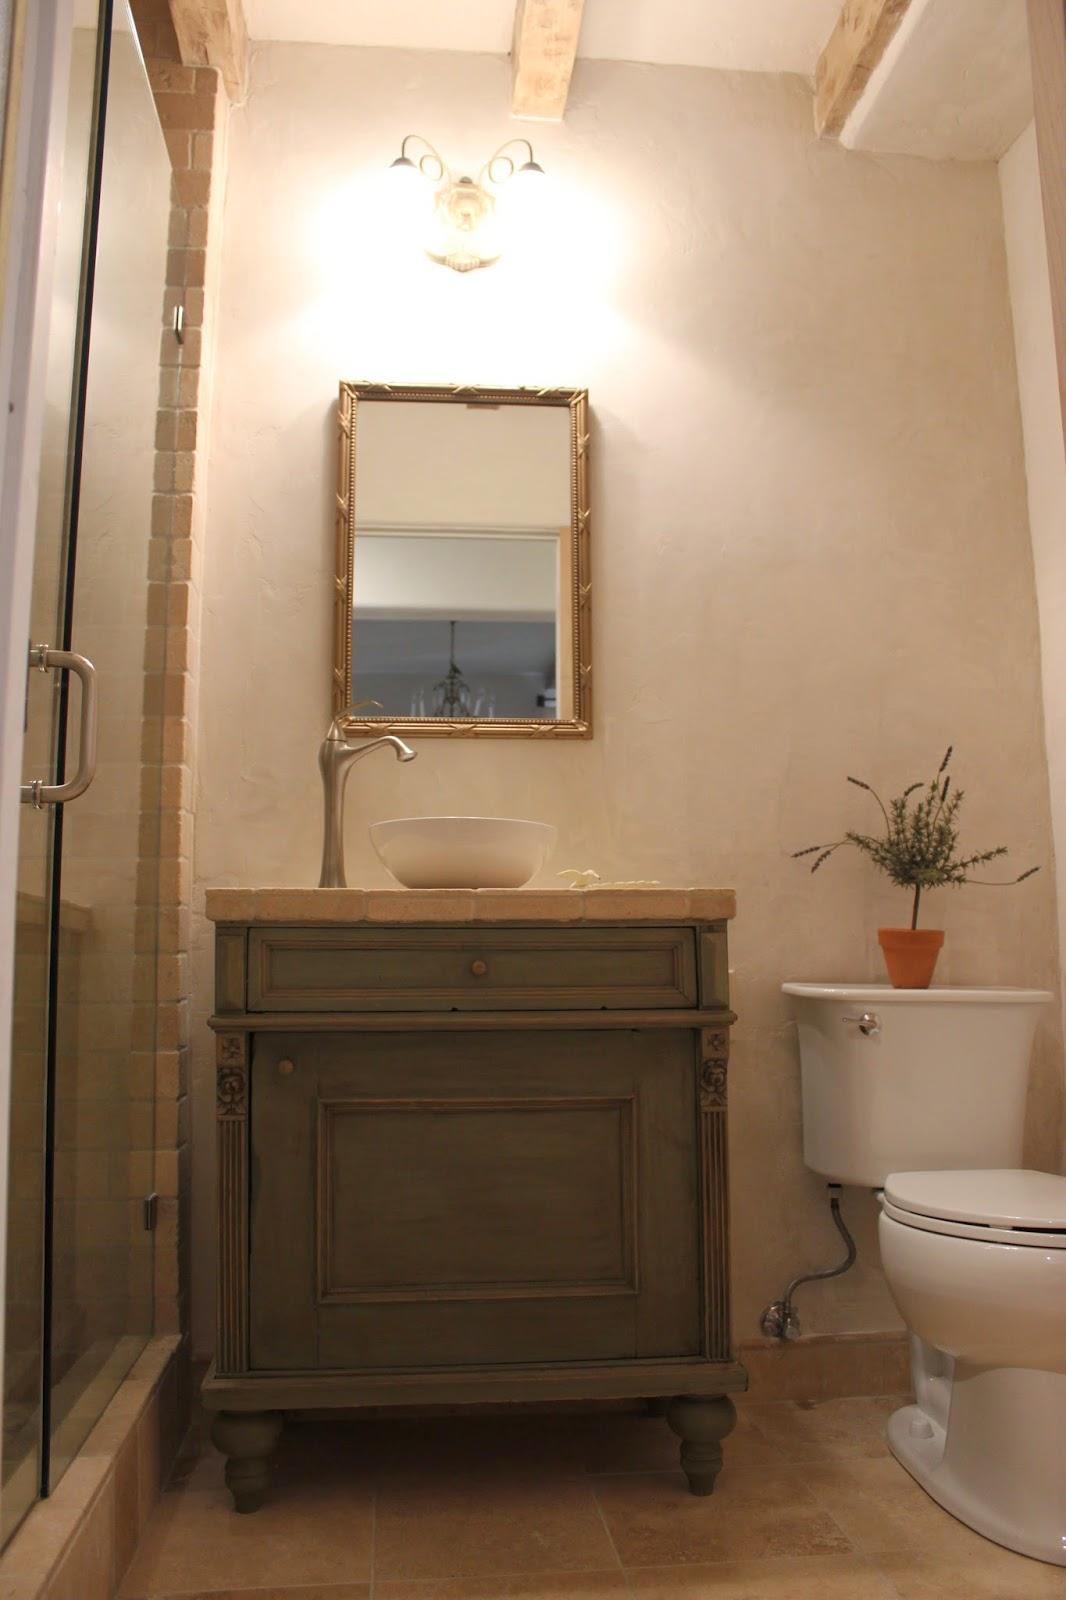 Vintage Our Bathroom Renovation is Complete